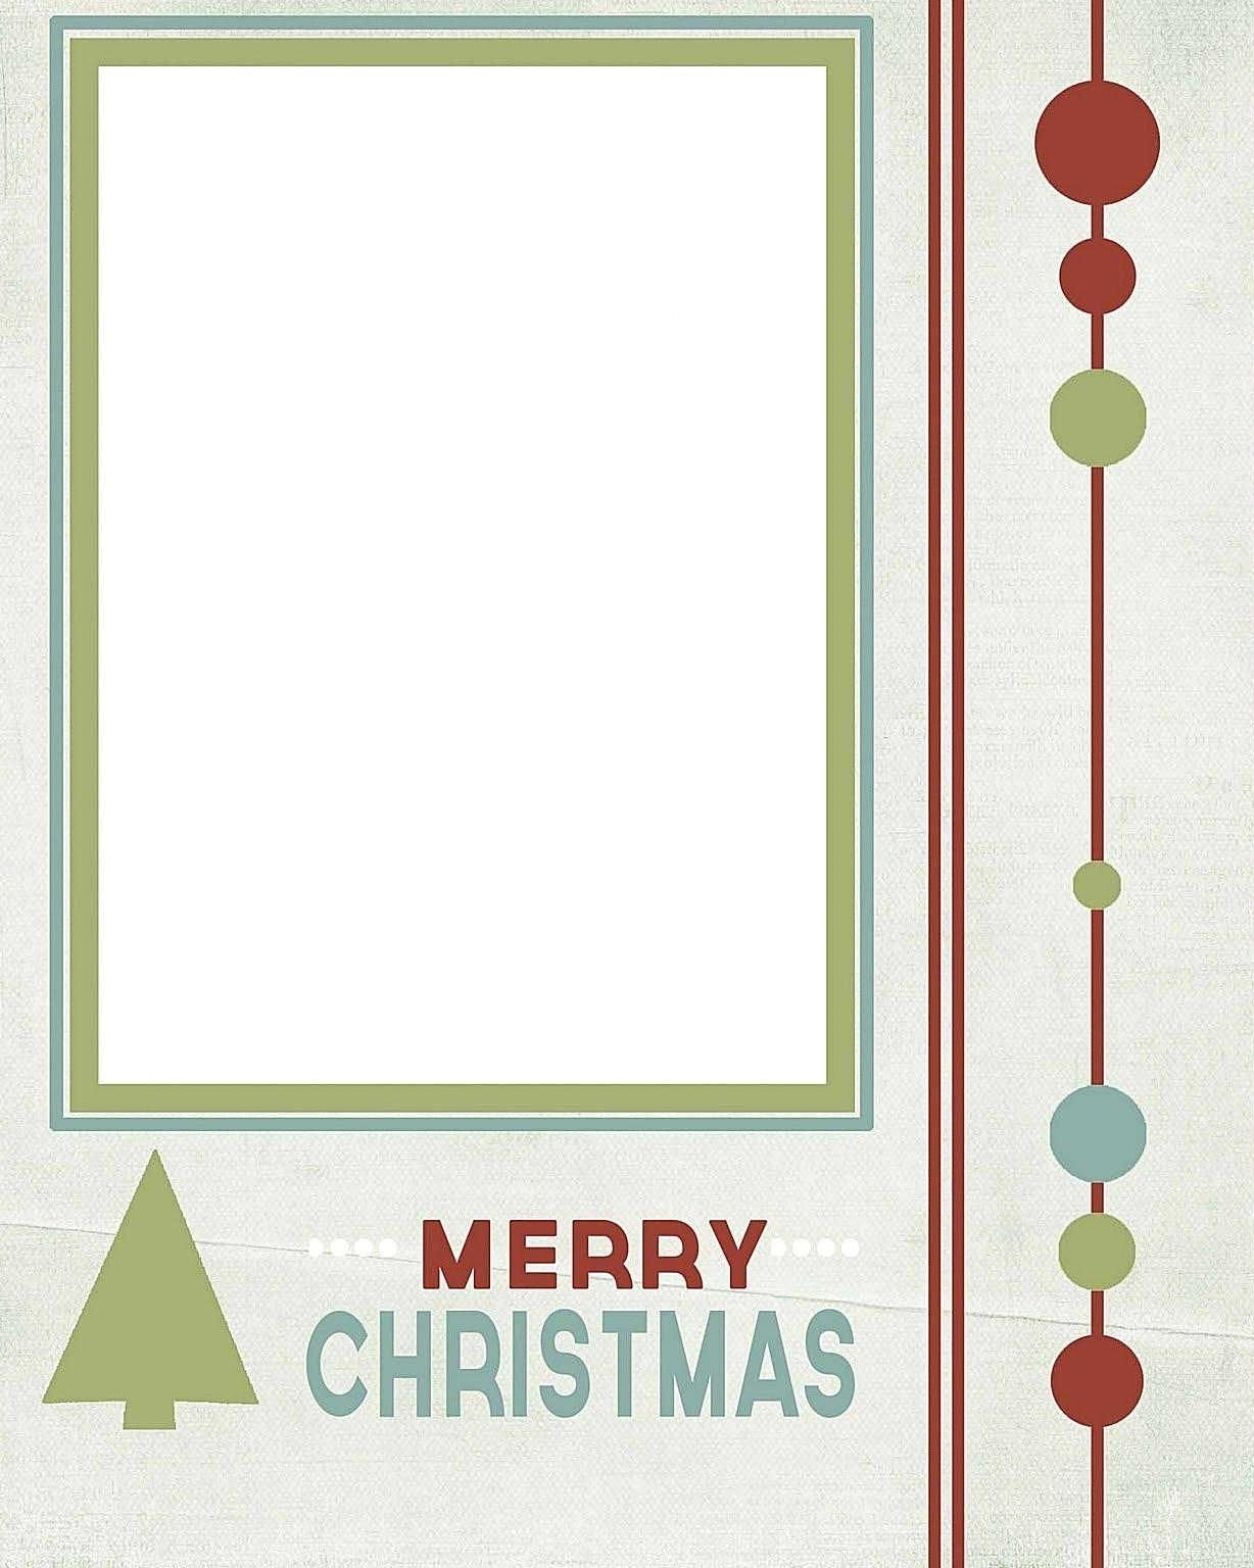 Printable Christmas Cards Digital Download Merry Christmas Etsy Christmas Card Templates Free Christmas Photo Card Template Holiday Card Template